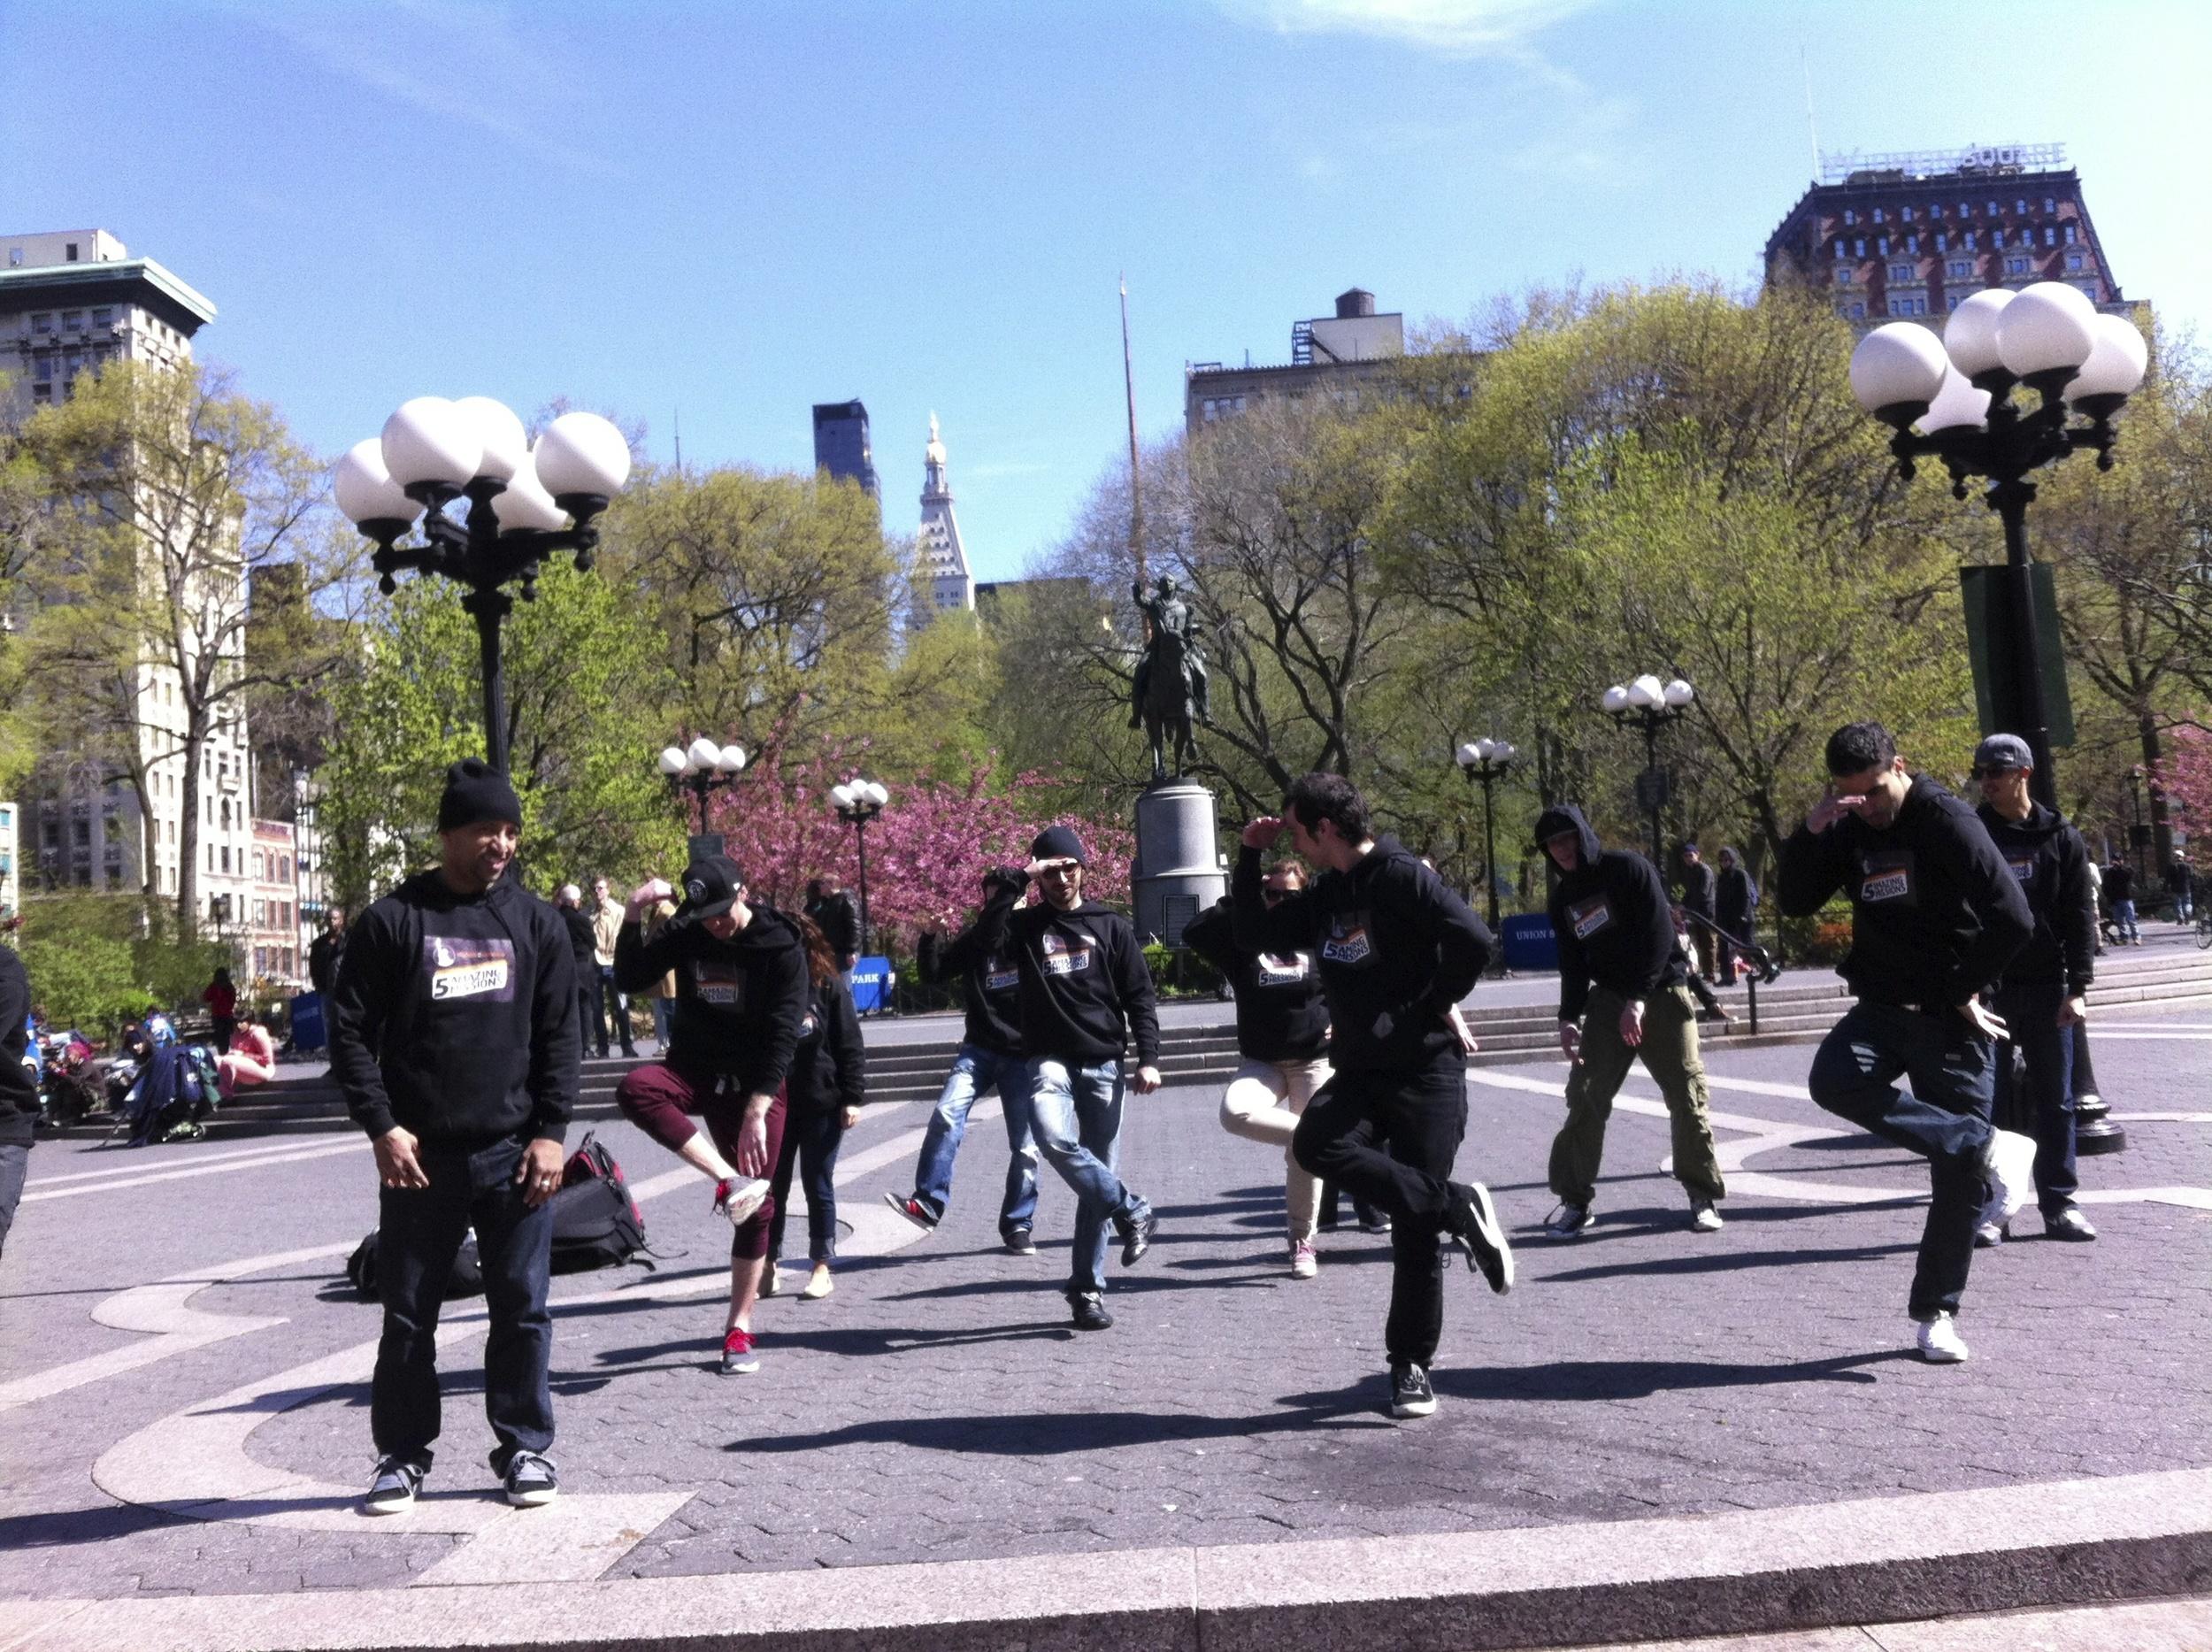 A flashmob at Union Square, NYC